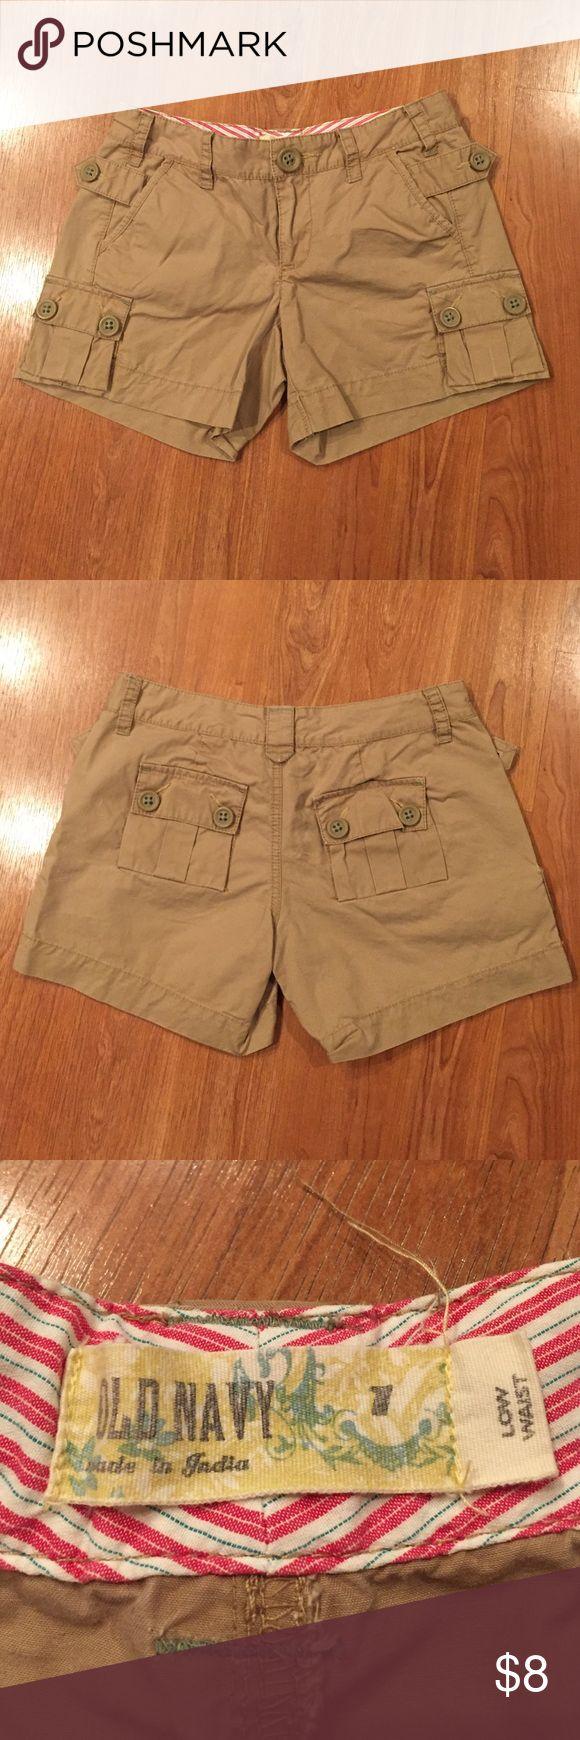 Old Navy Women's cargo shorts 100% cotton shorts Old Navy Shorts Cargos